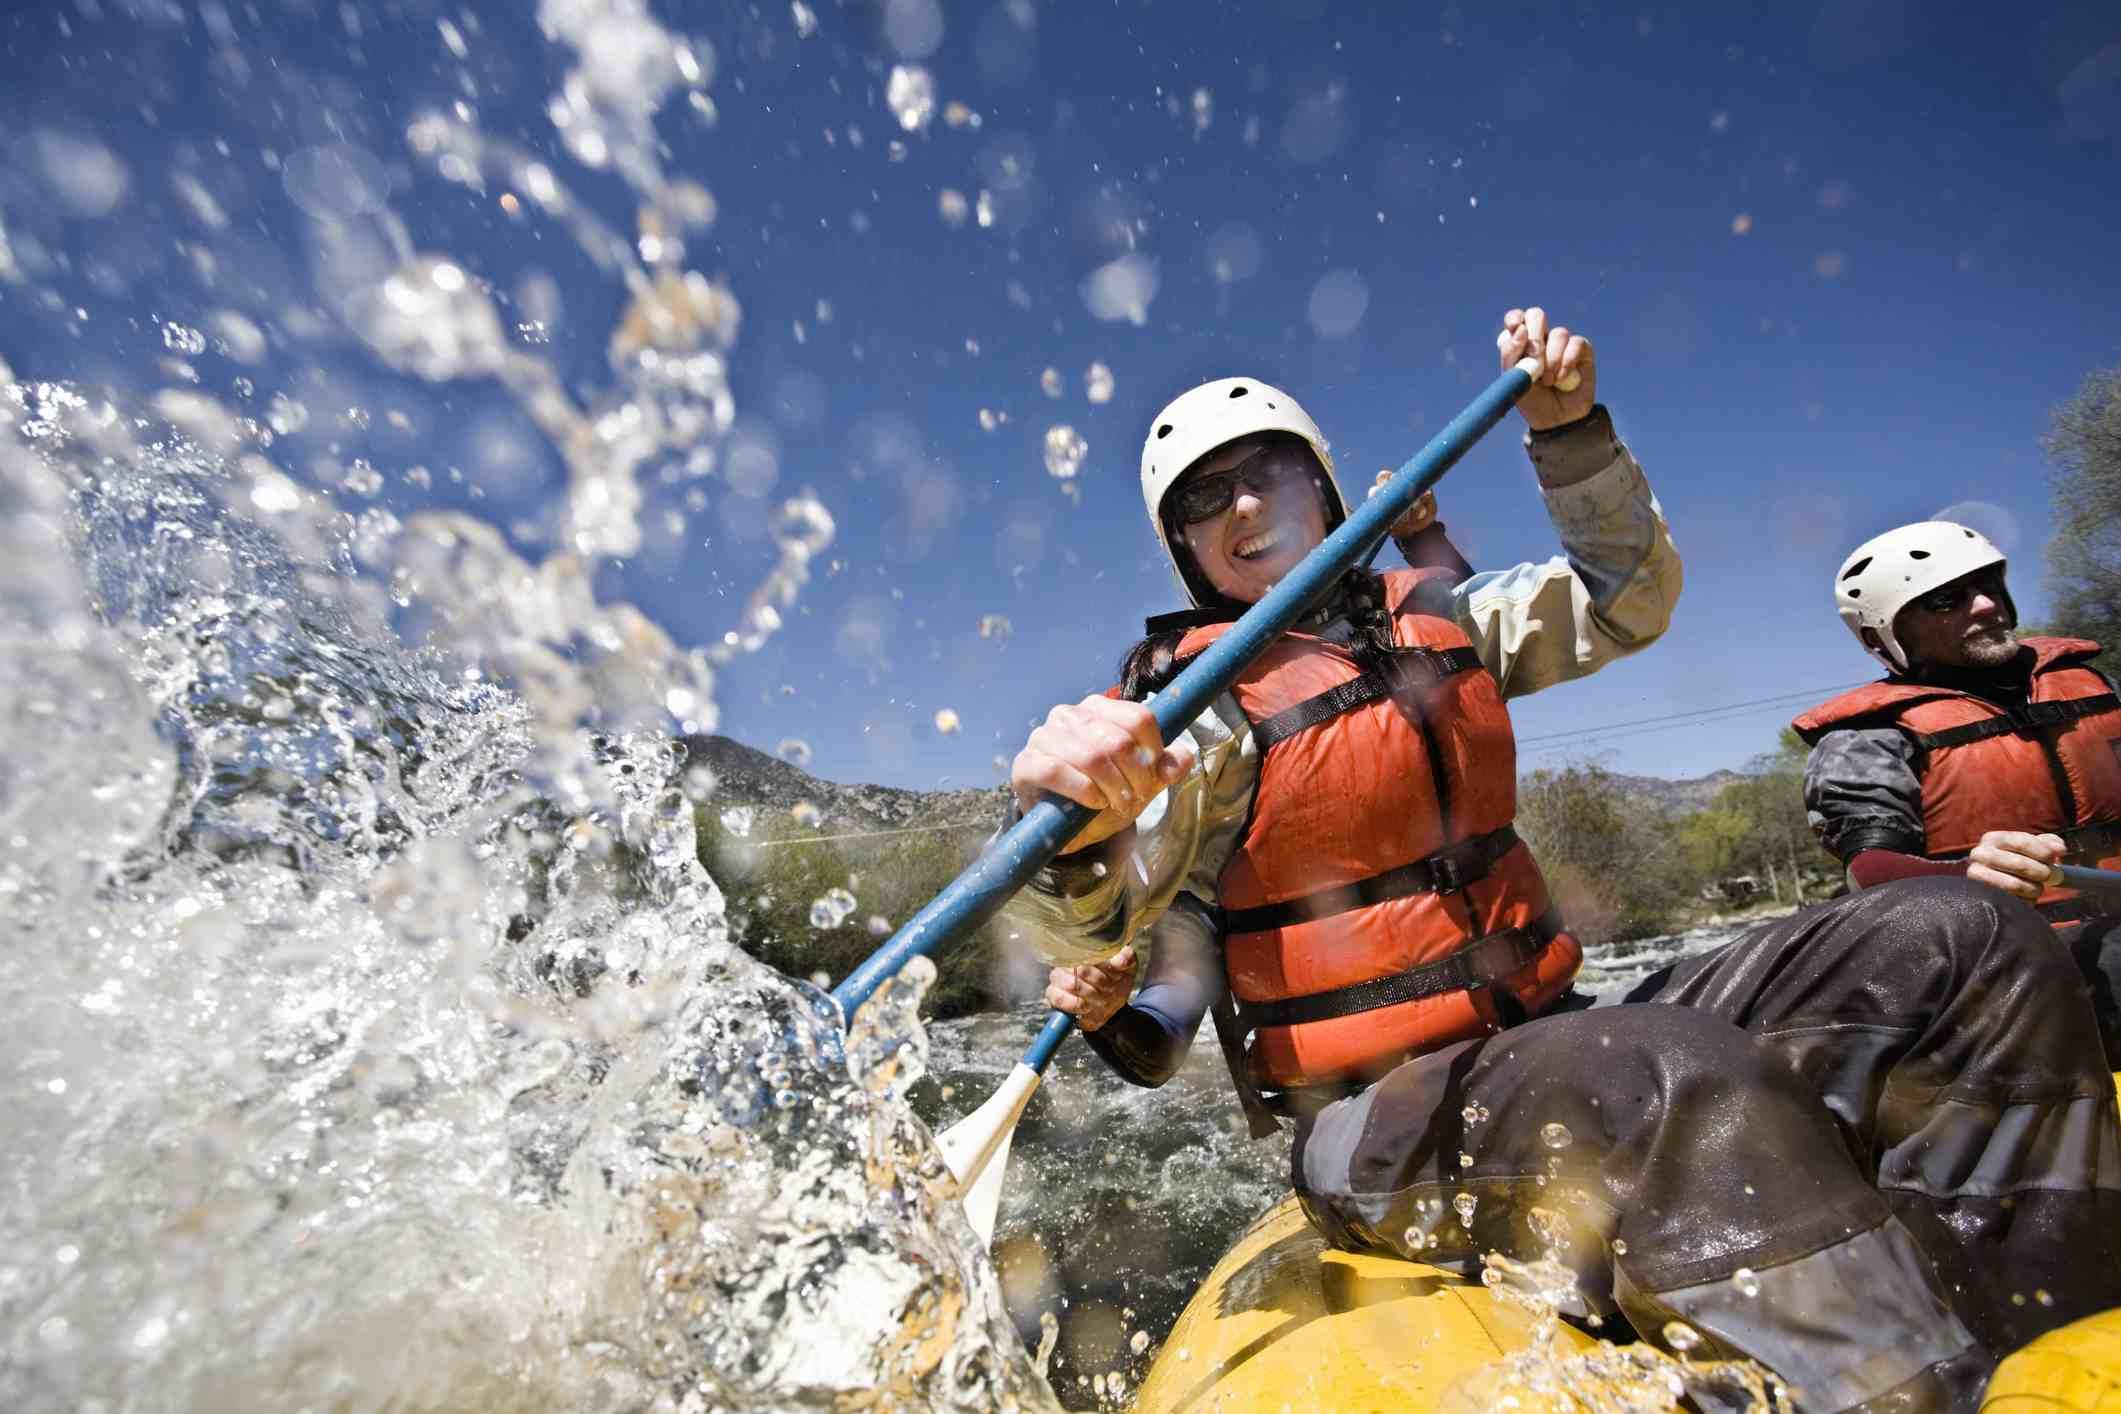 Adrenalin Junkies Africa Whitewater Rafting